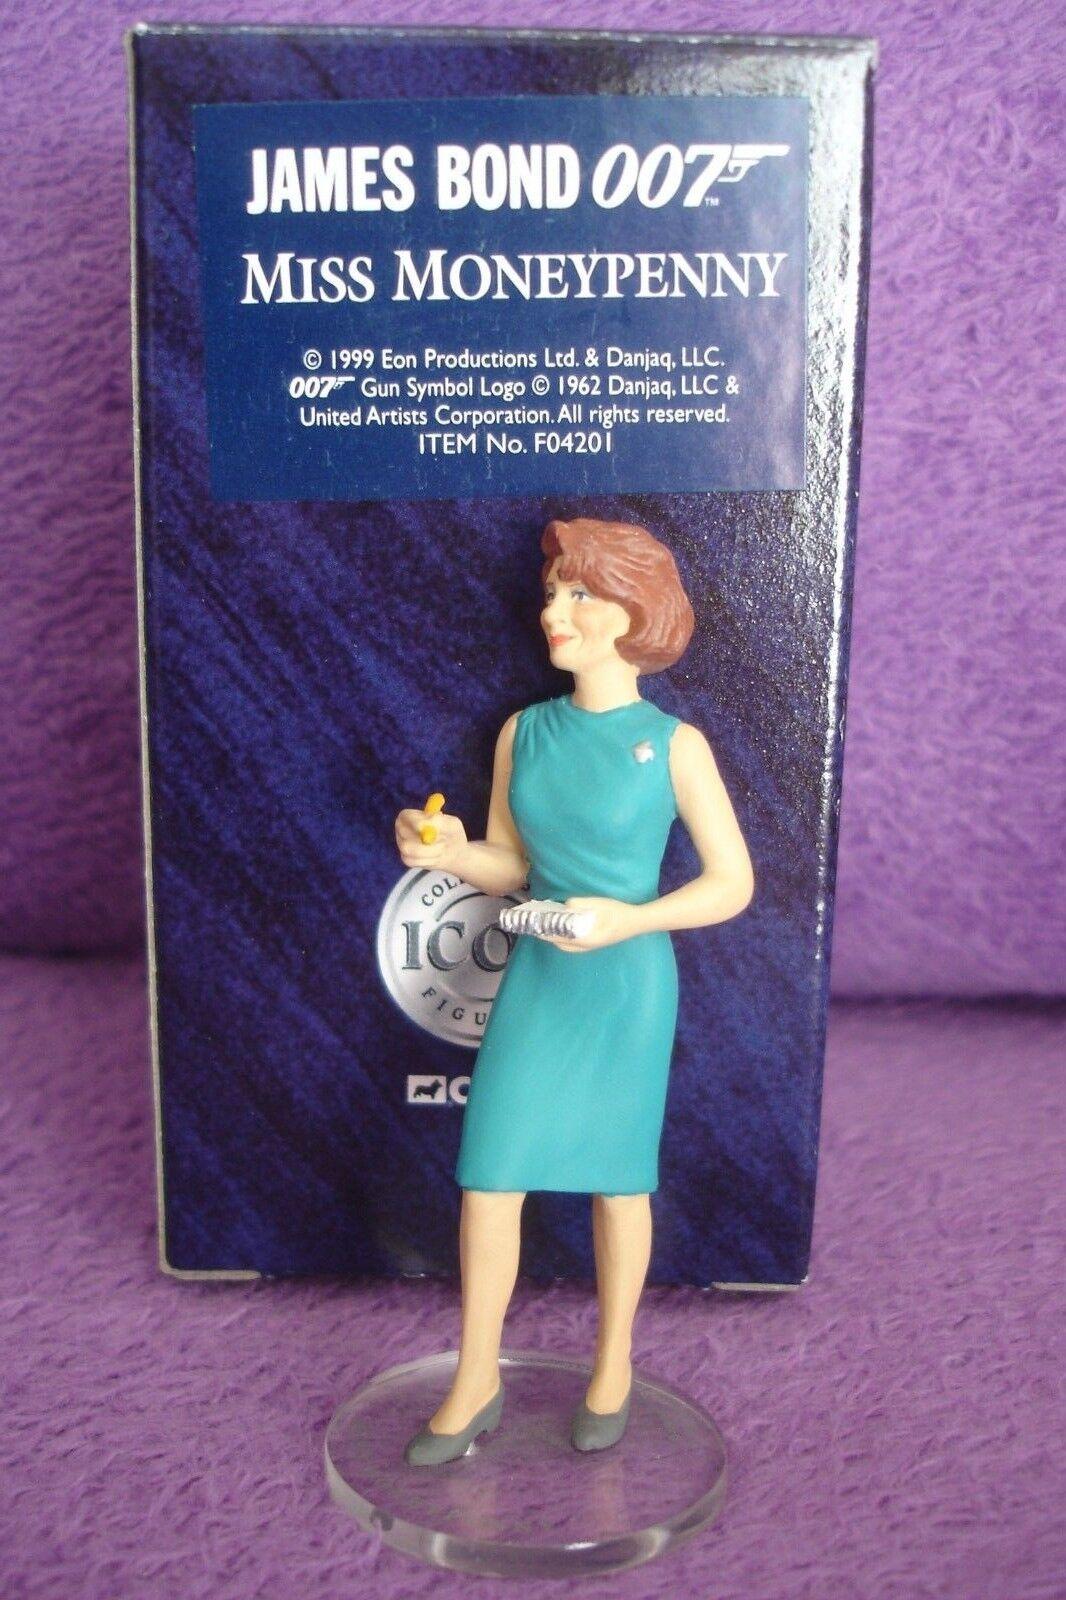 Corgi Icon James Bond 007 Boxed Figure Miss Moneypenny # F04201 c1999 | Moins Cher